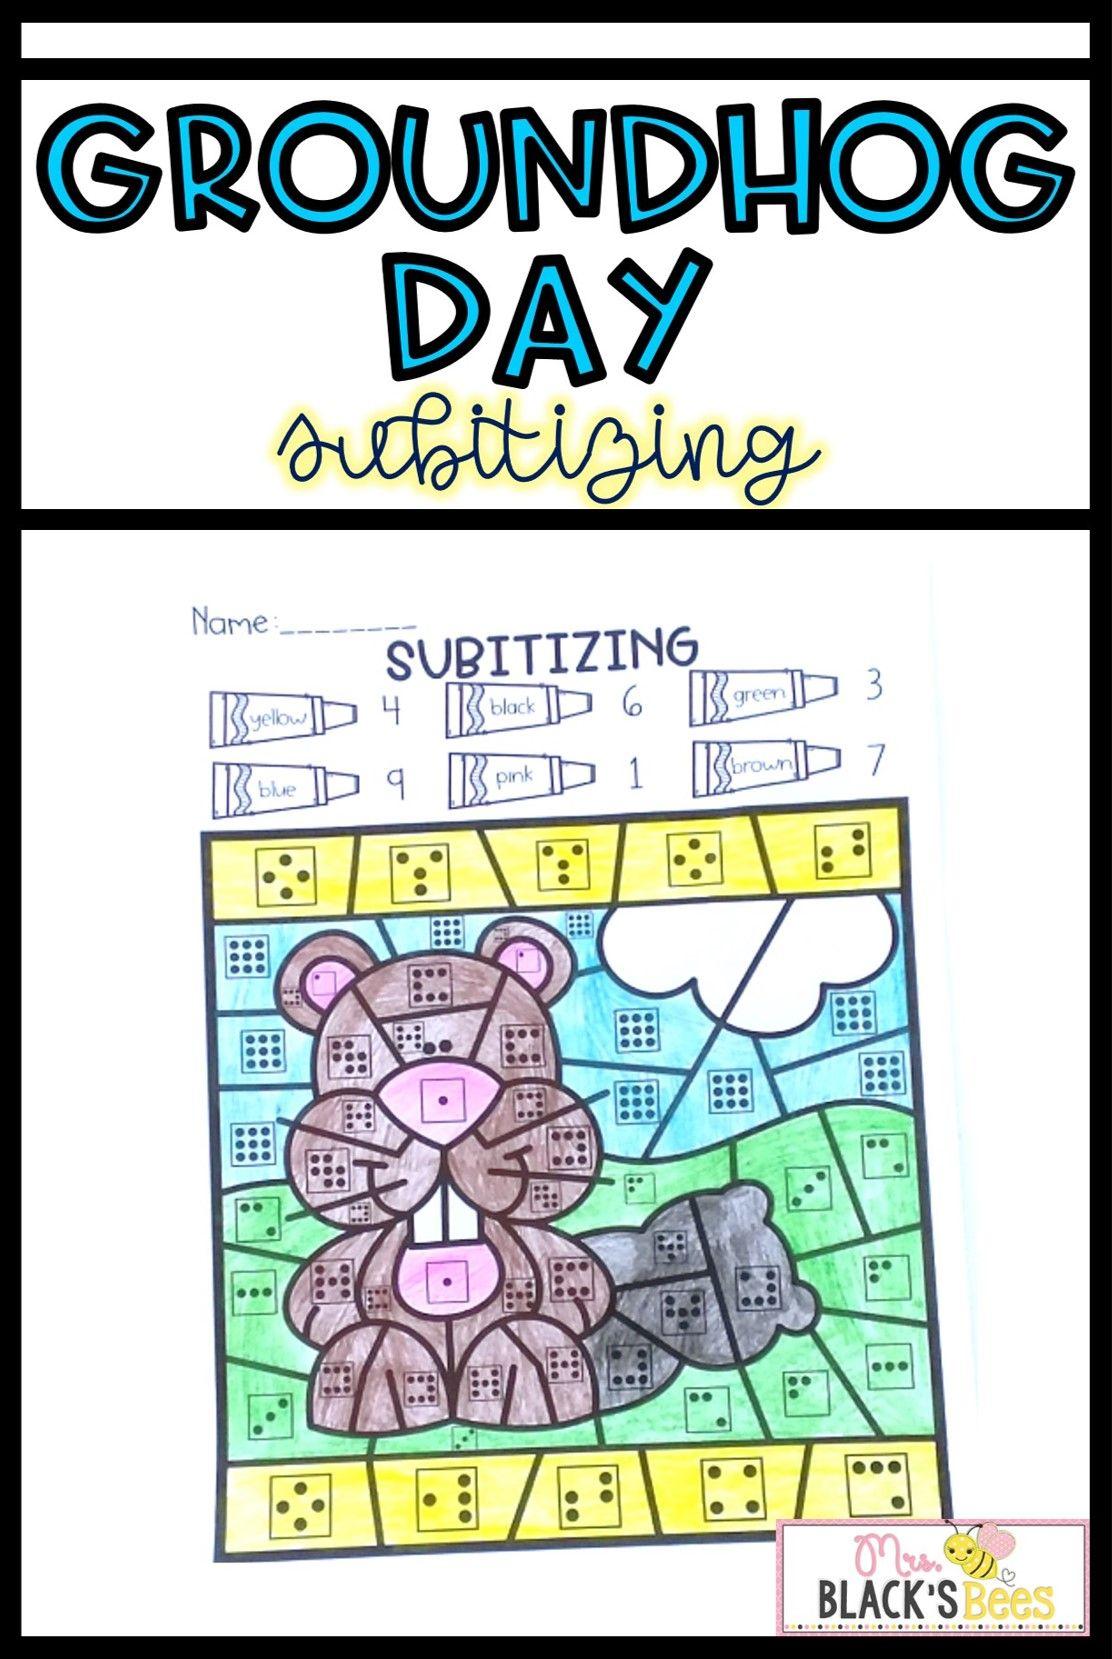 Groundhog Day Activities Subitizing Worksheets Groundhog Day Groundhog Day Activities Subitizing [ 1659 x 1112 Pixel ]